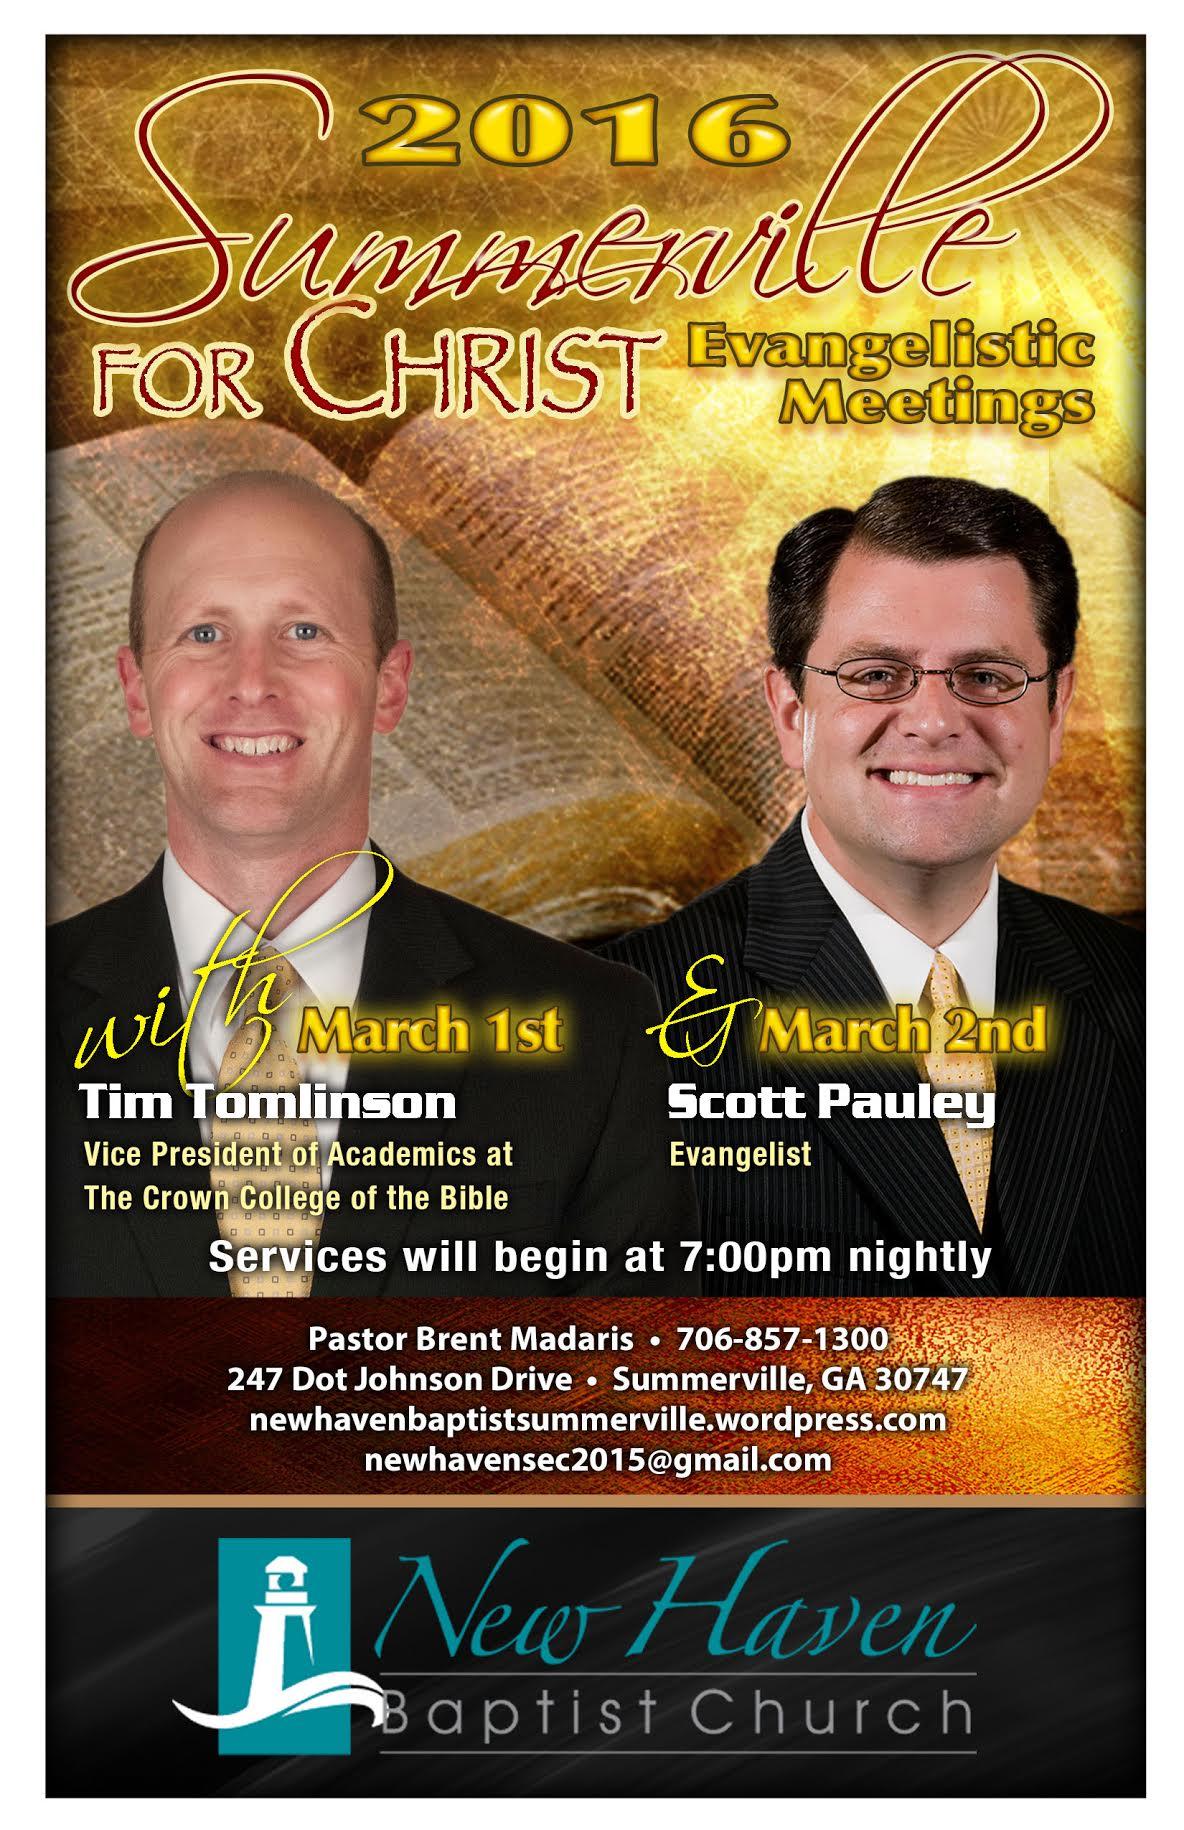 Area Meeting: 2016 Summerville for Christ Evangelistic Meetings – New Haven Baptist Church – Summerville, GA